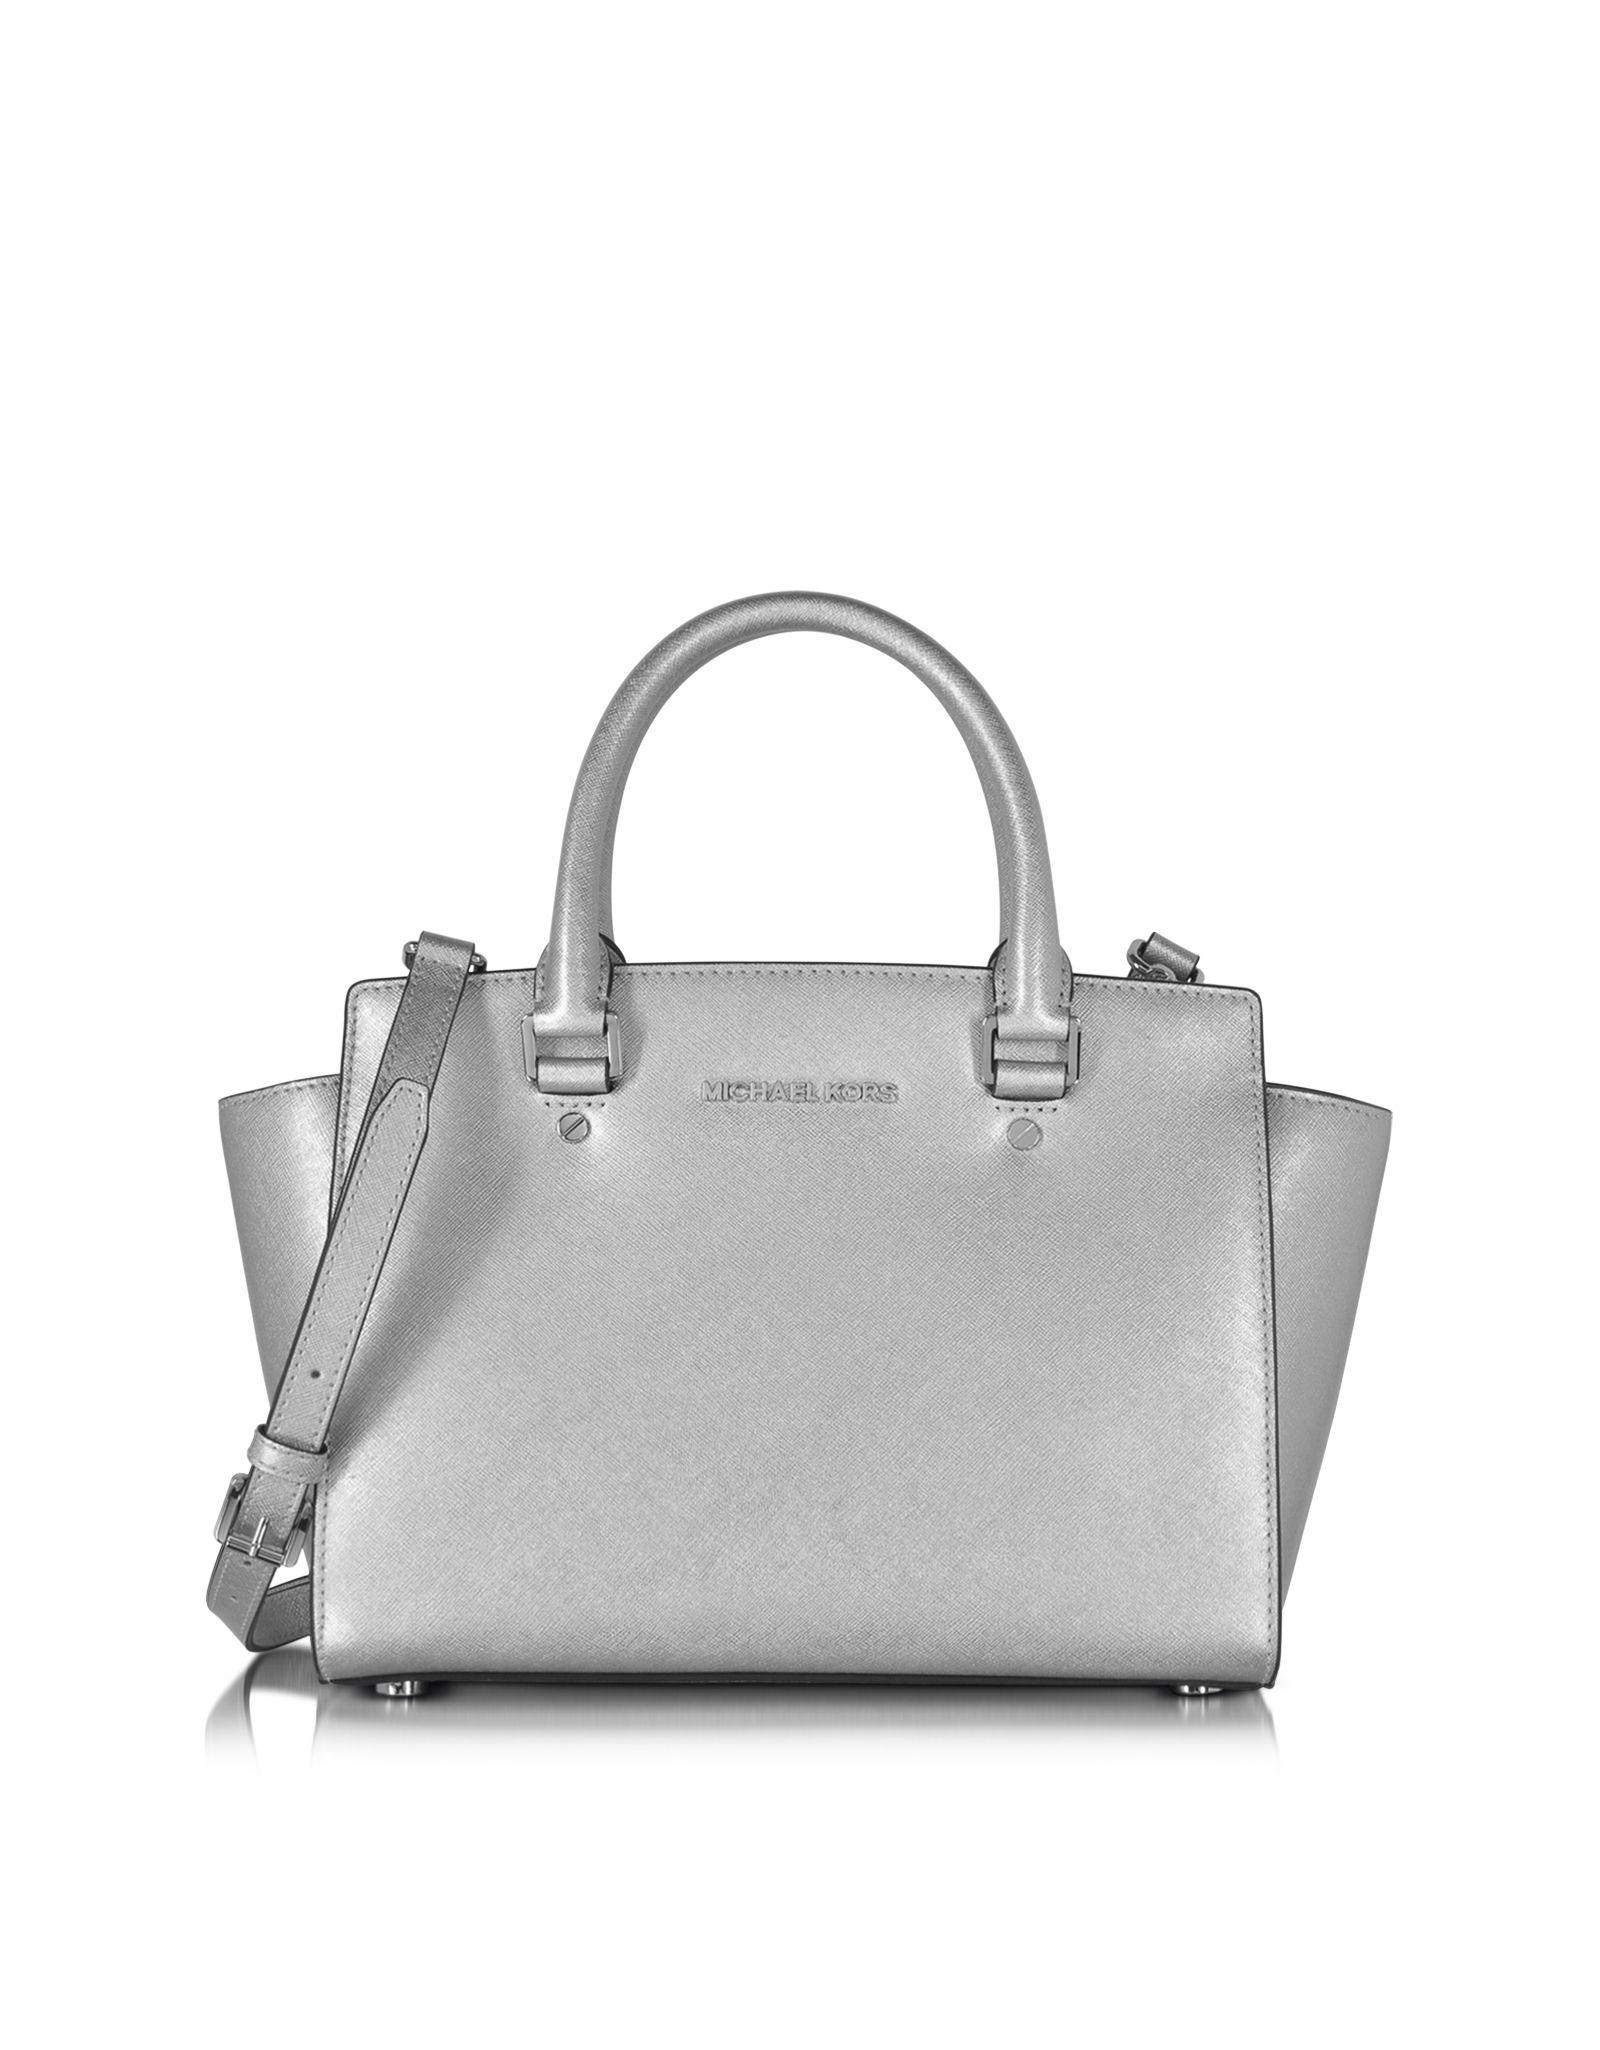 Michael Kors Selma Saffiano Leather Medium Satchel Bag In Silver